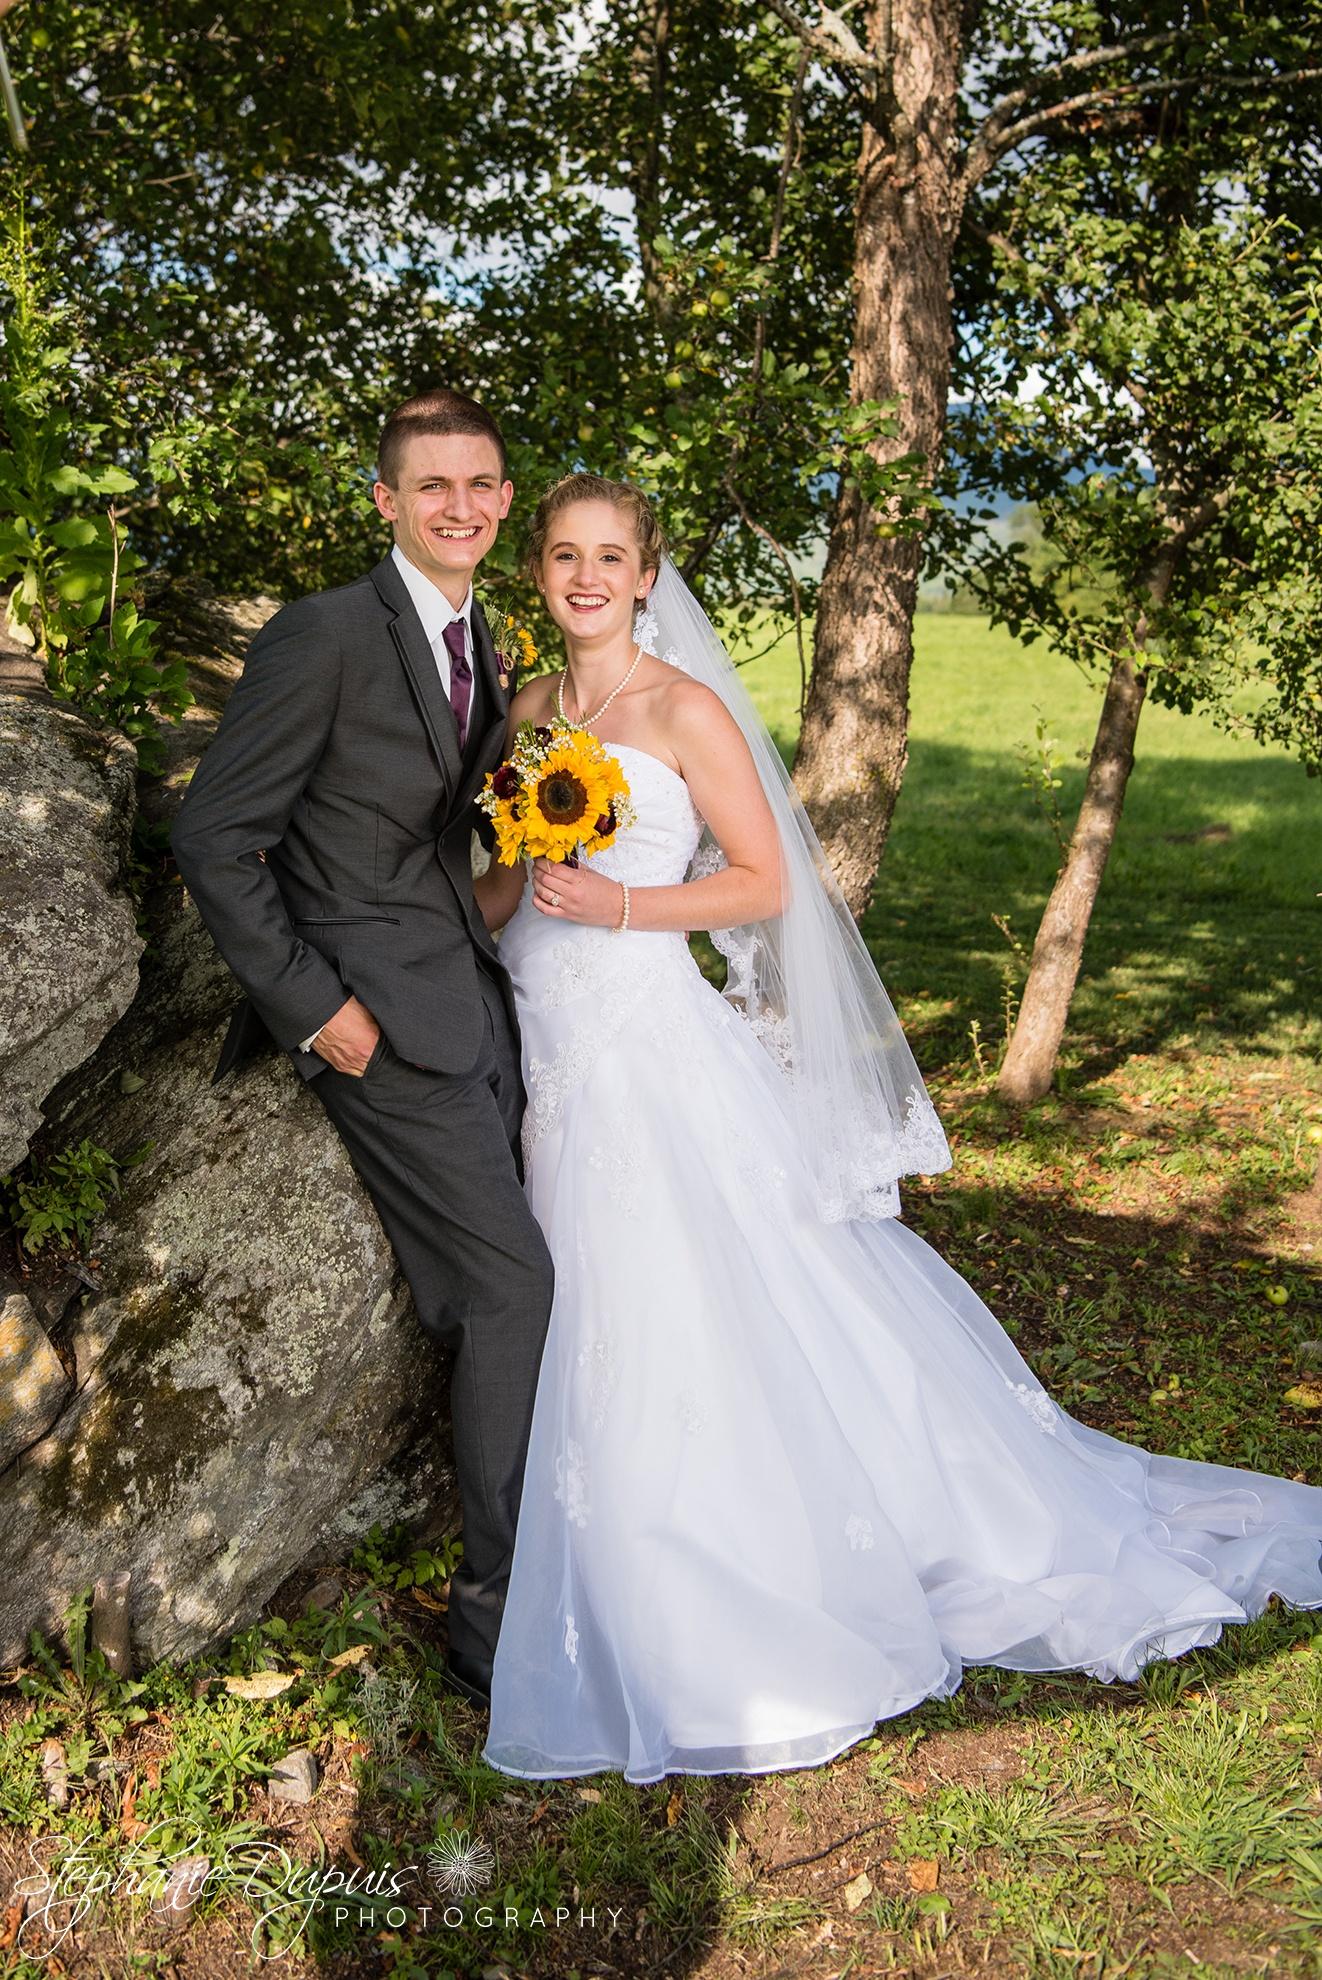 Jefferson Wedding Photographer 02 1 - Portfolio: Ward Wedding